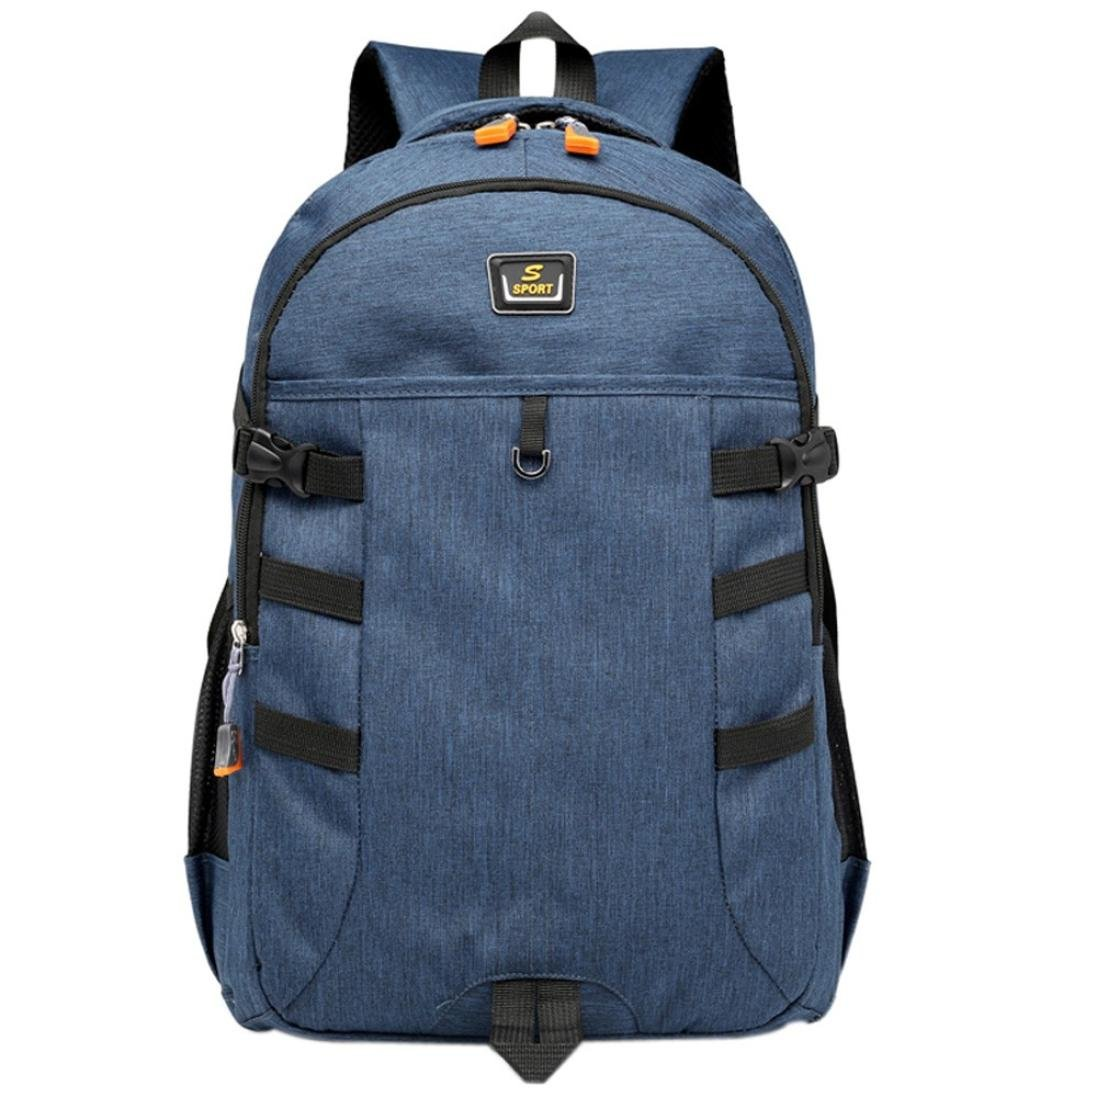 FimKaul Unisex Classic Oxford School Backpack Laptop Bag Student Bag Travel Bag (Blue)